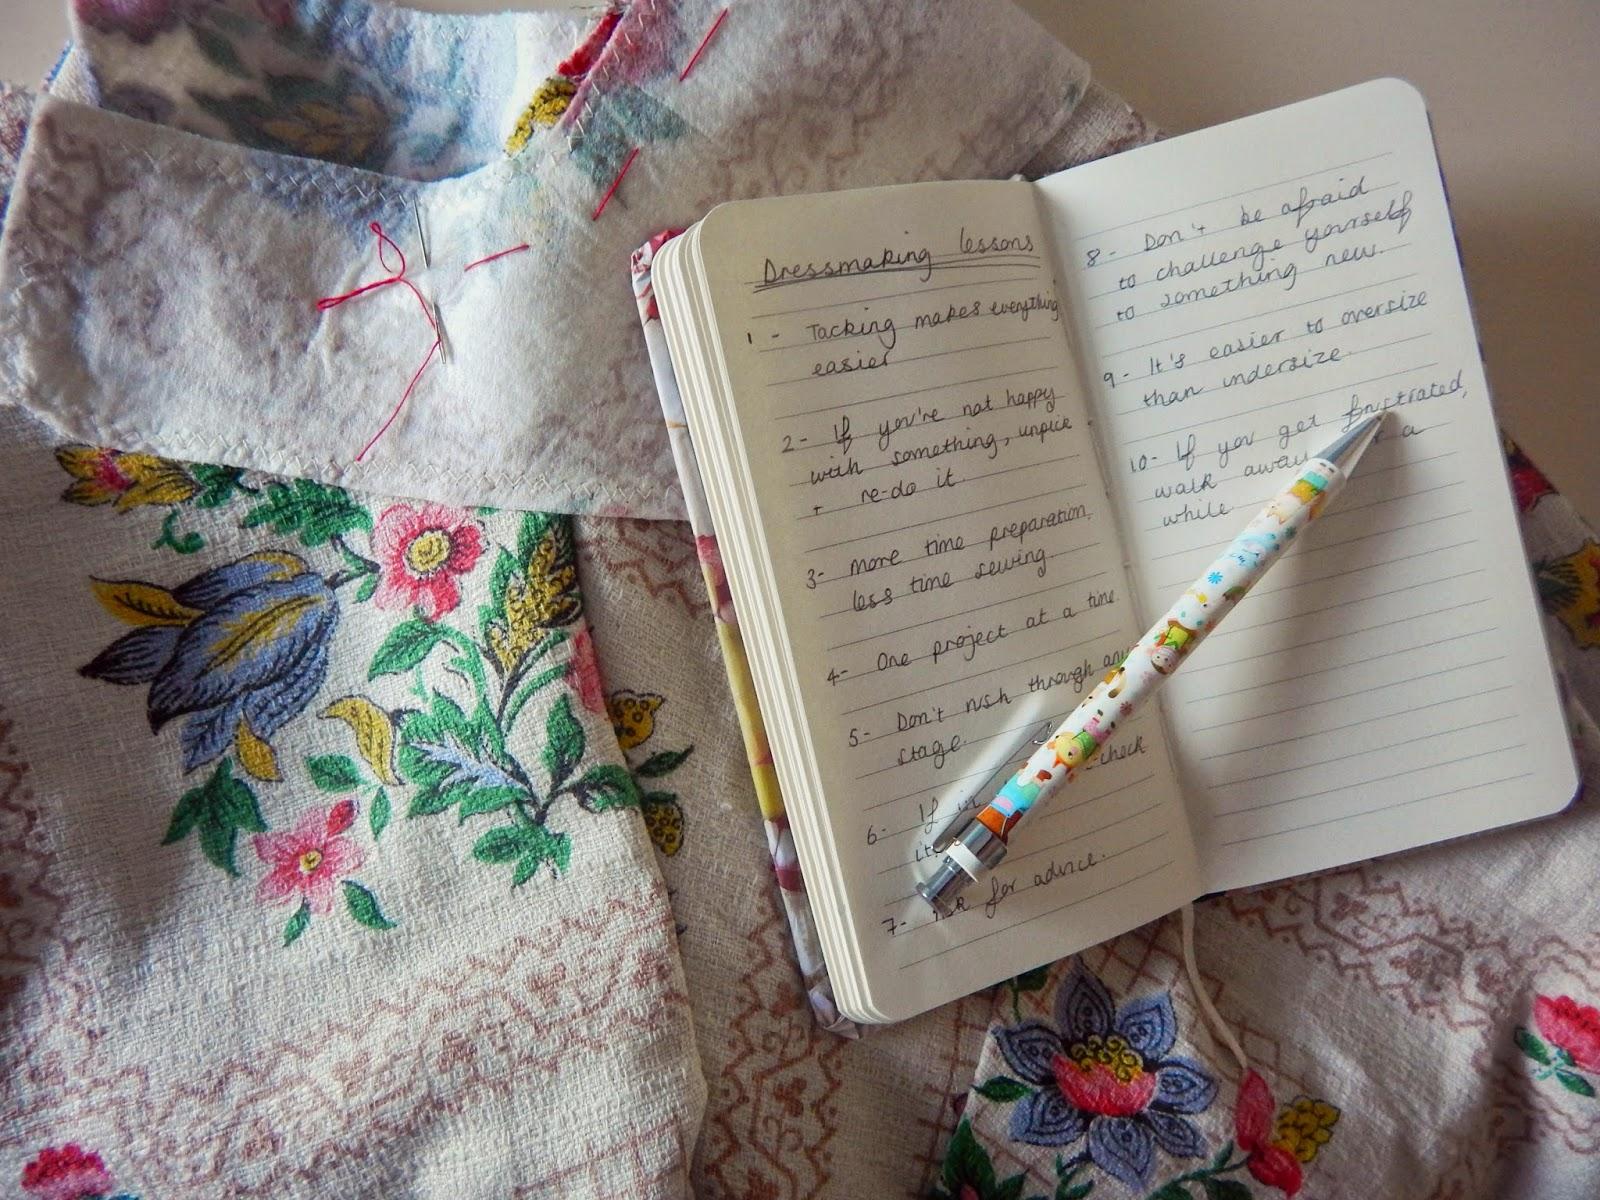 dressmaking rules